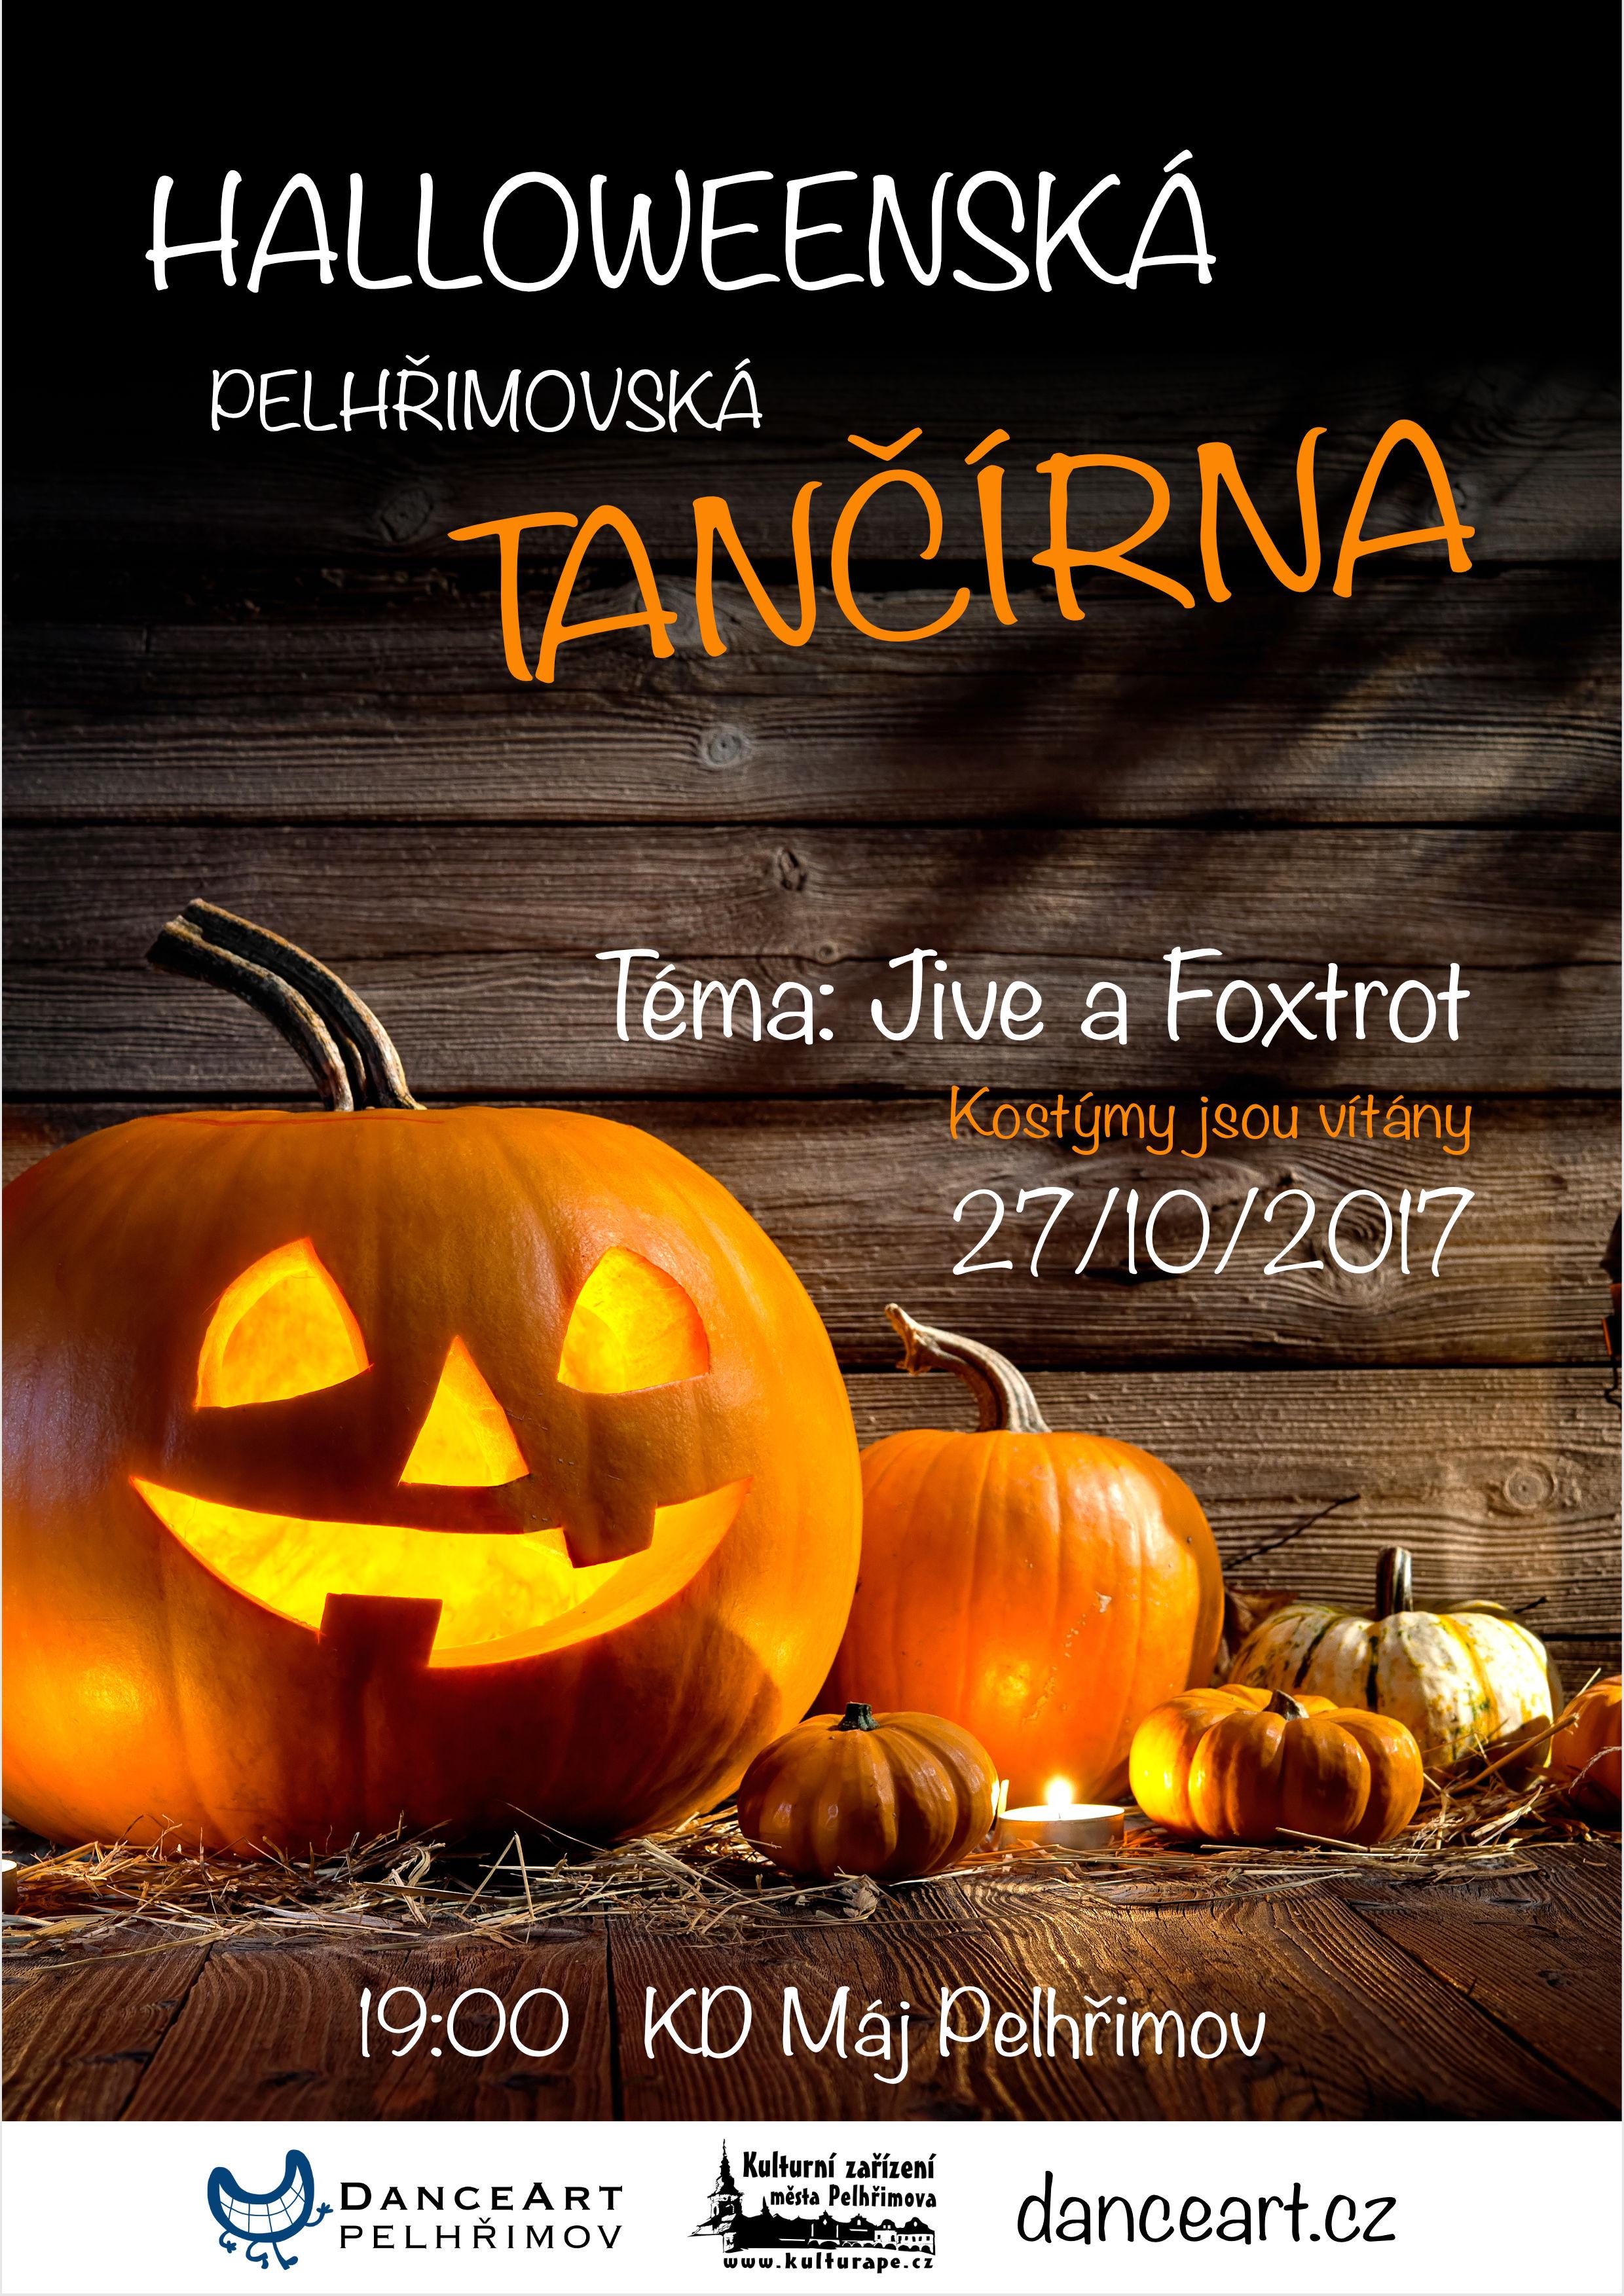 Plakát Halloweenská PT 10:17 web okraj.jpg